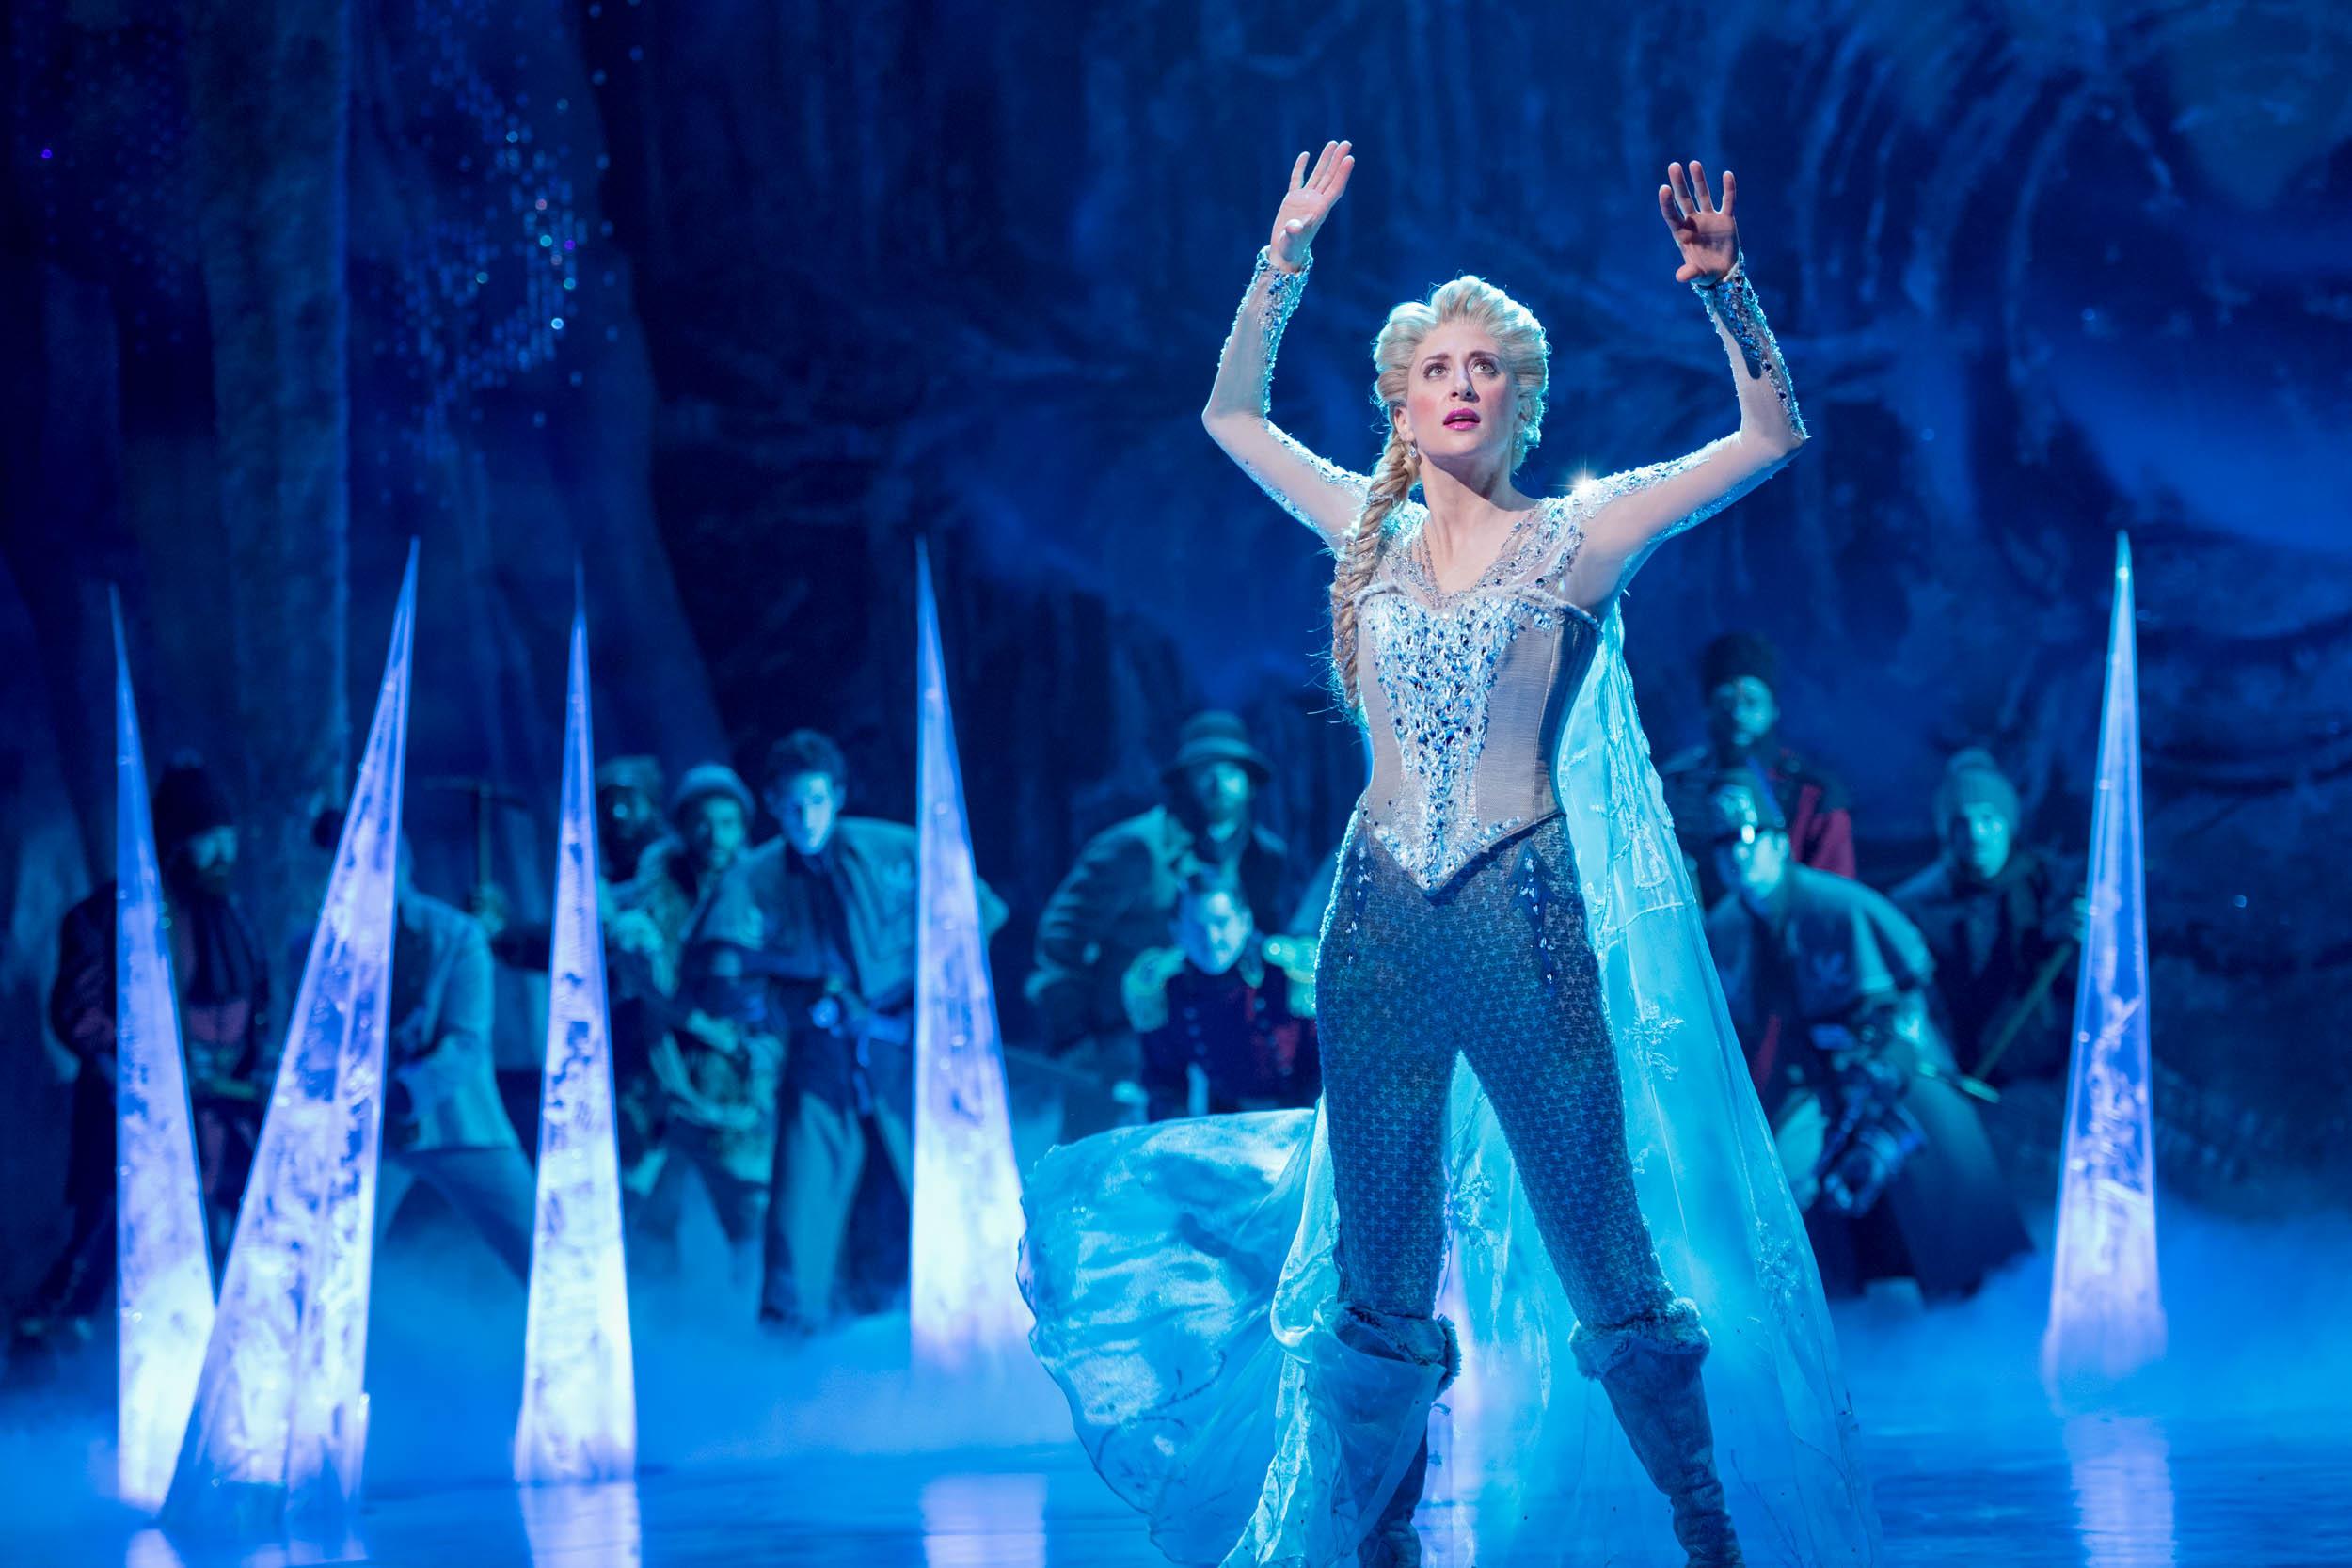 Frozen, the Broadway musical